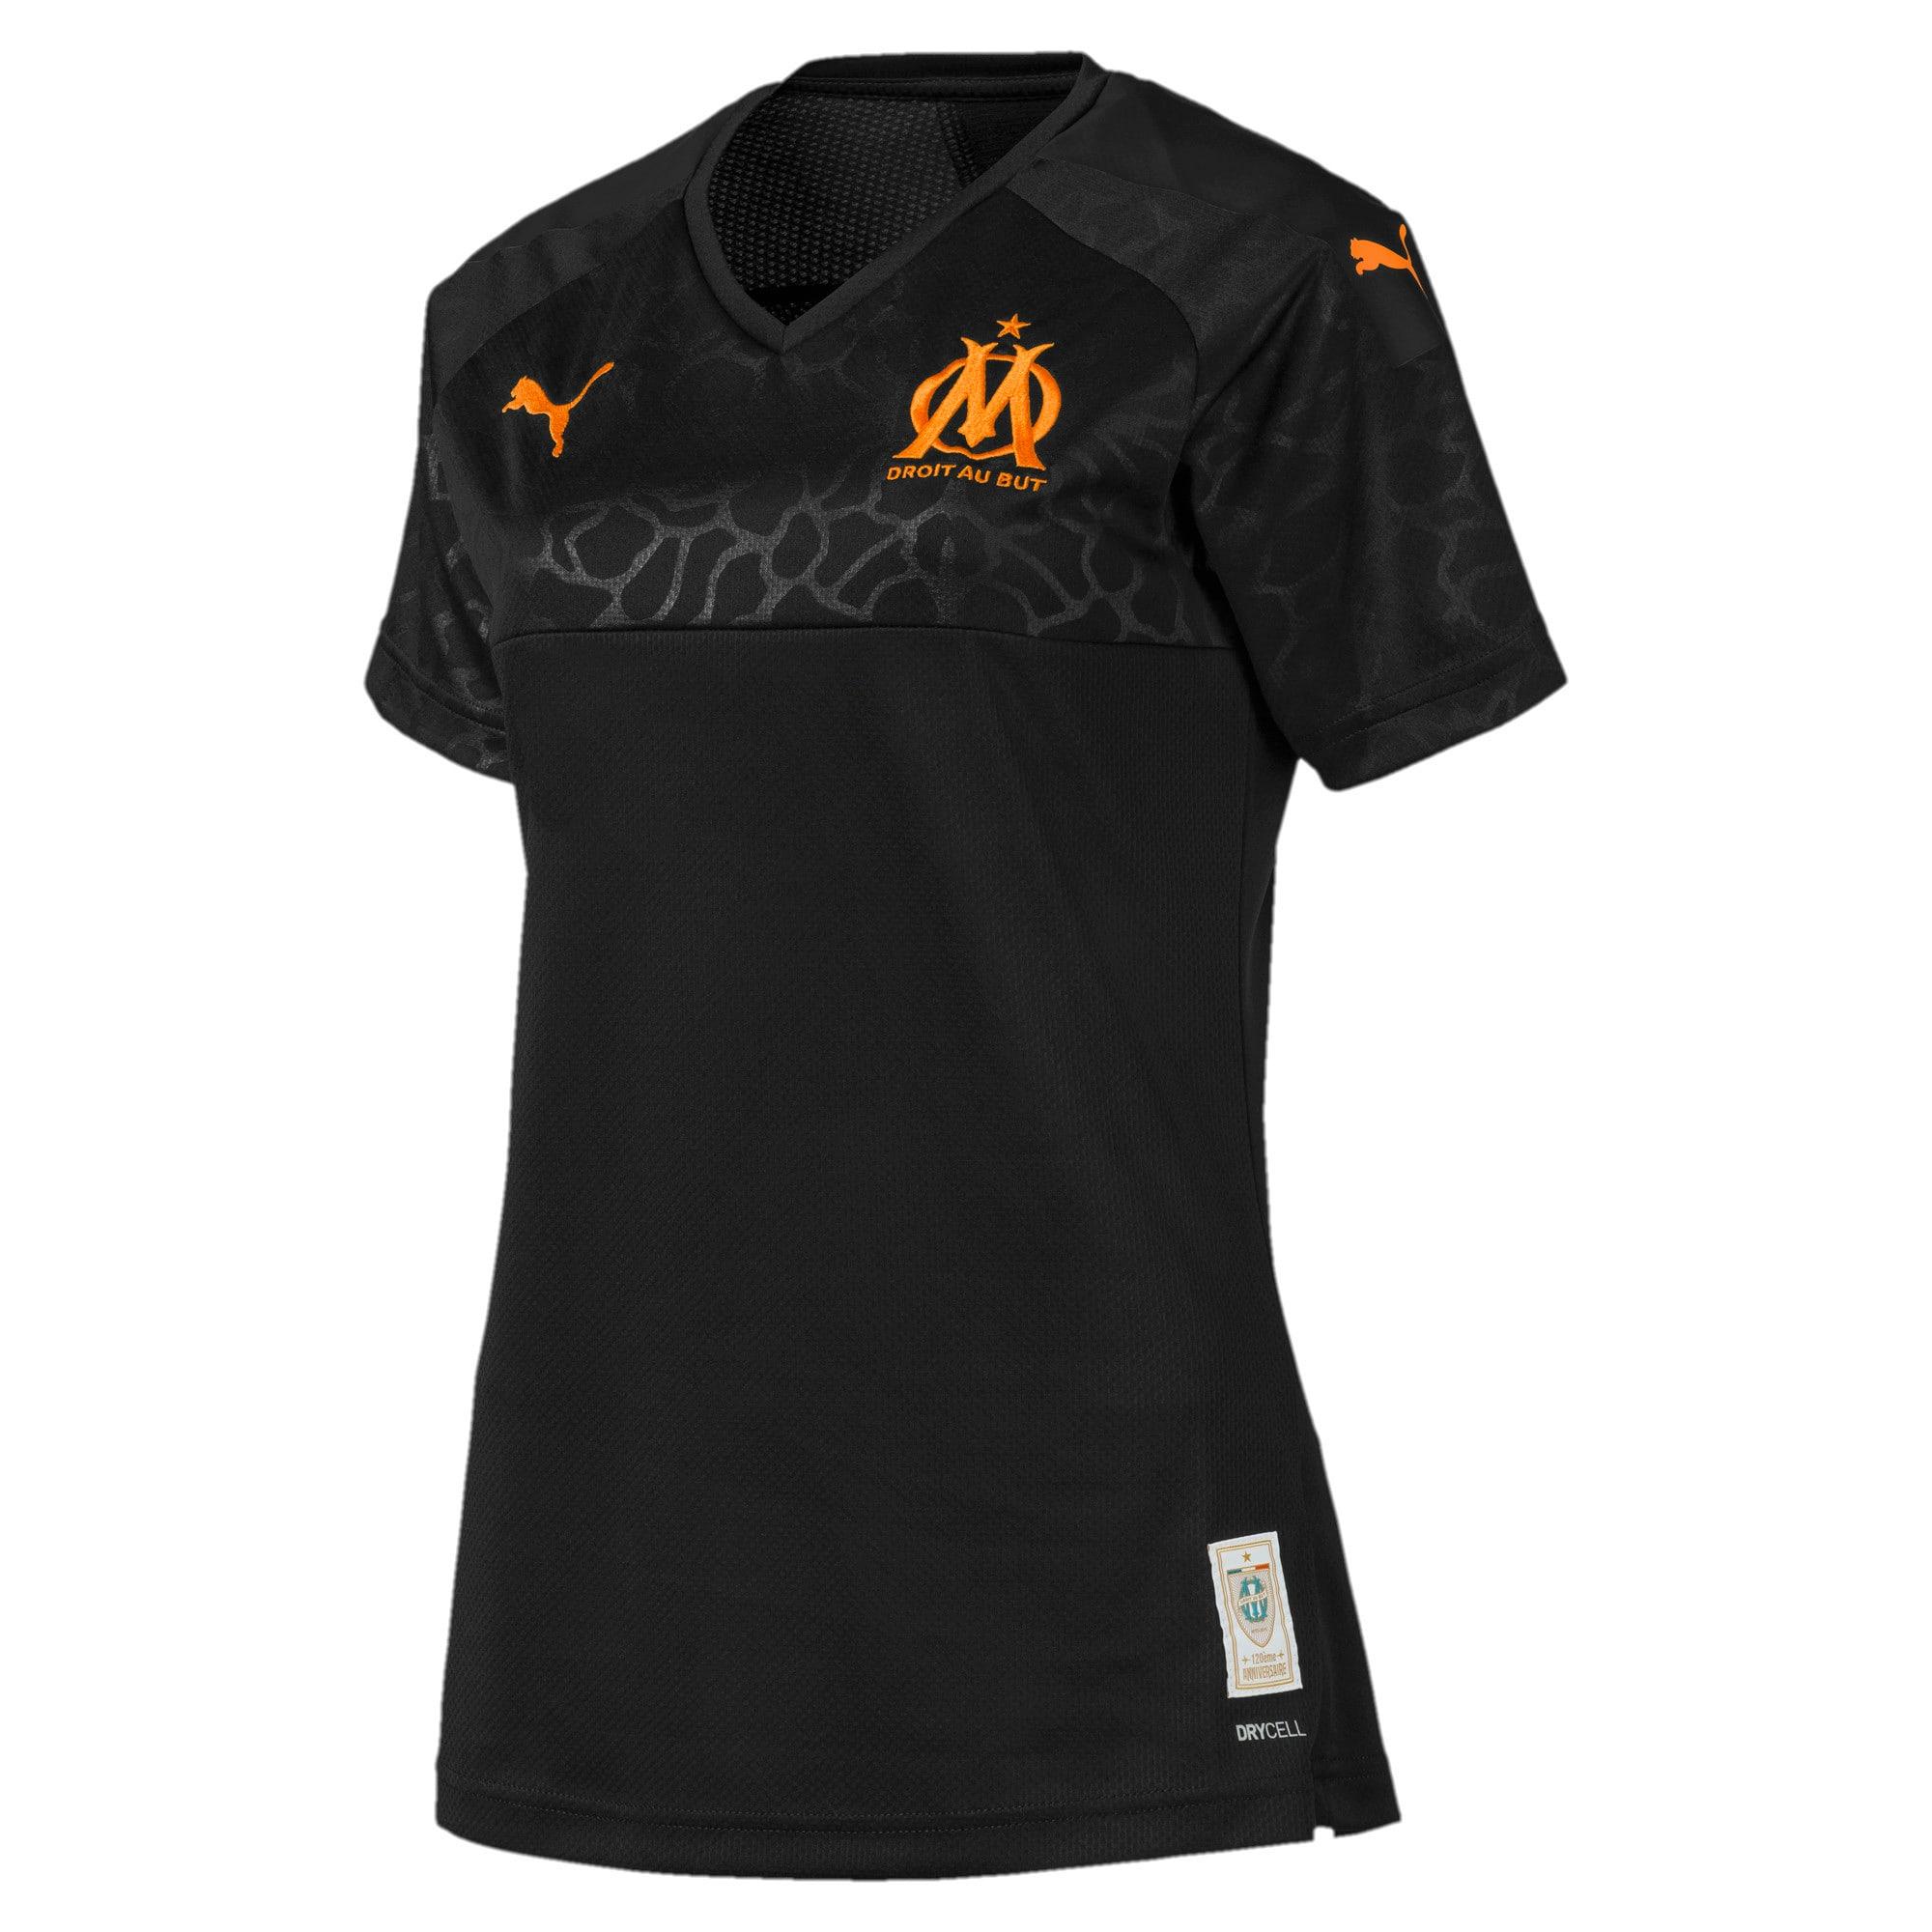 Thumbnail 1 of Olympique de Marseille Women's Replica Third Jersey, Puma Black-Orange Popsicle, medium